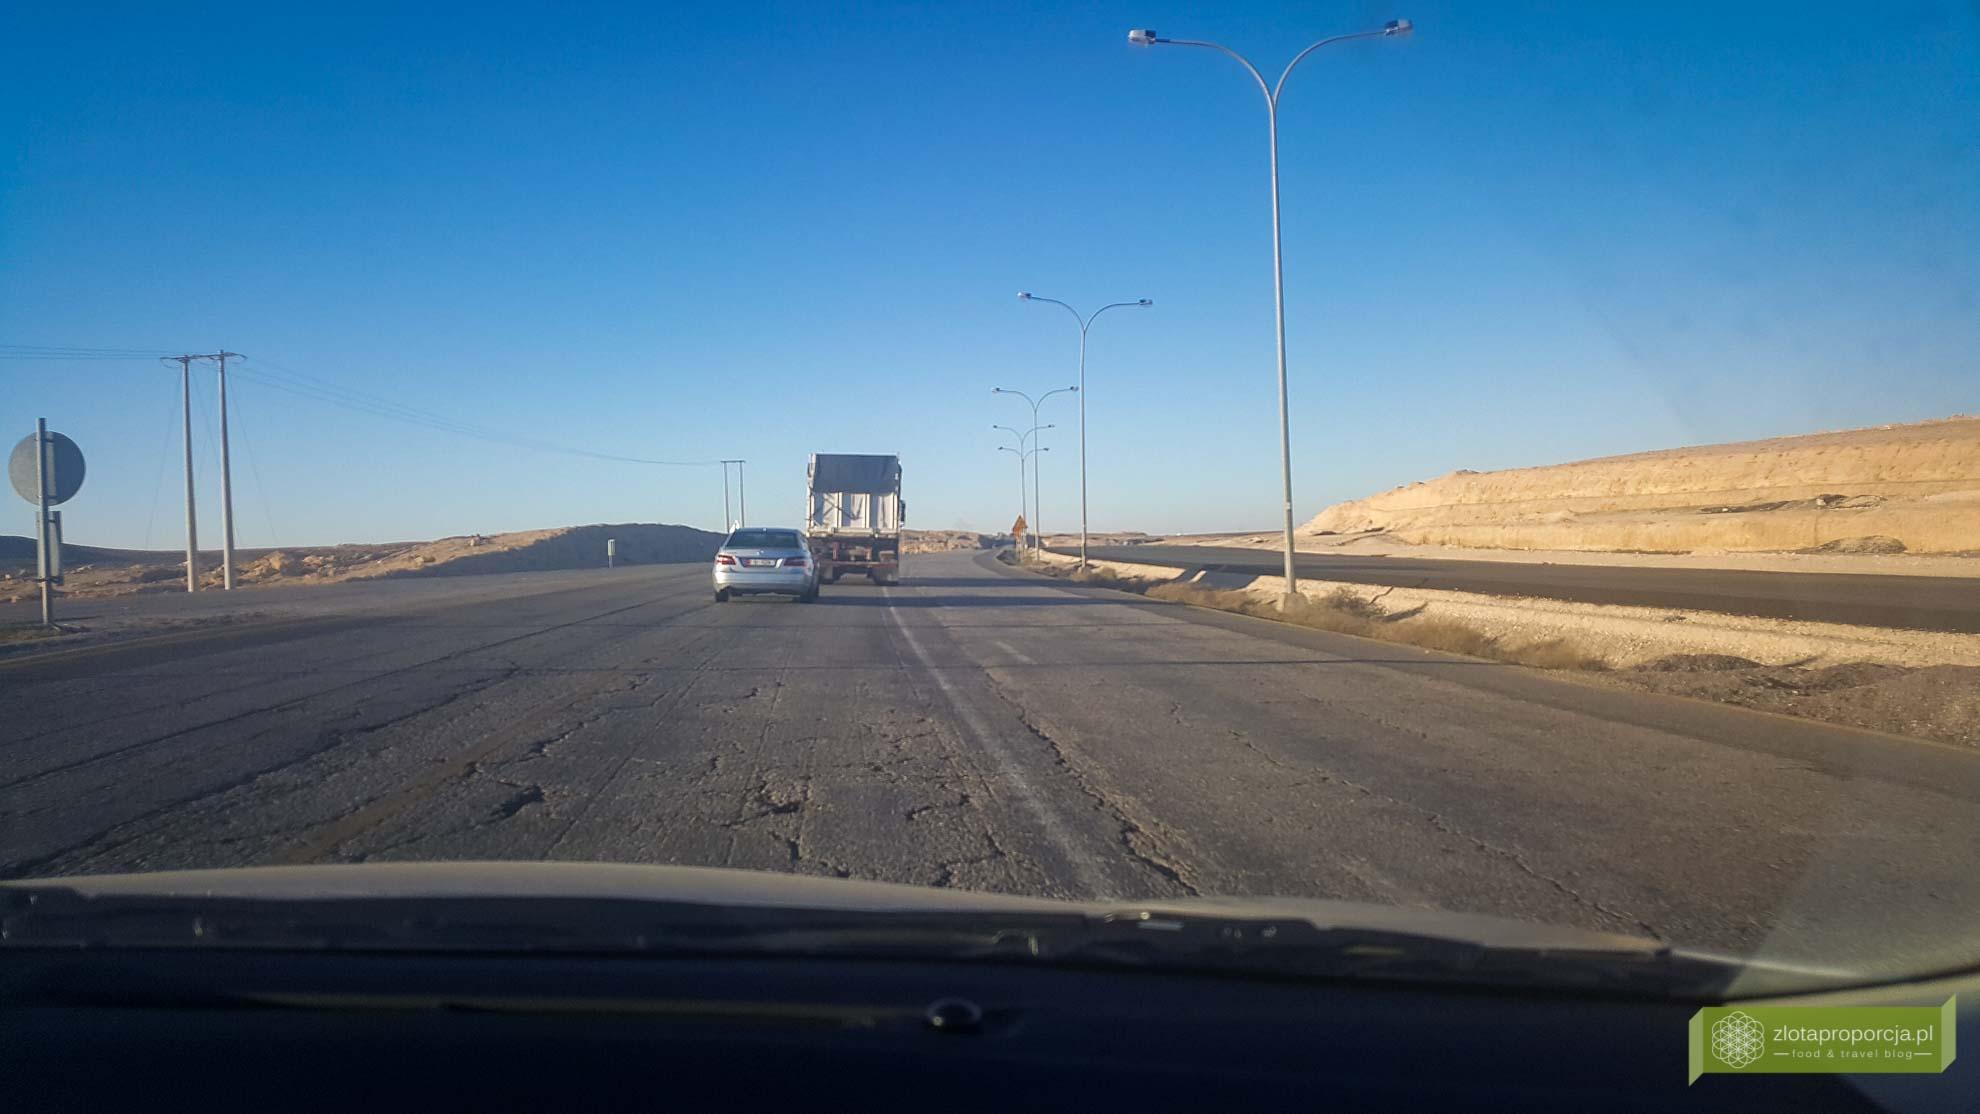 Jordania, Jordania samochodem, Jordania drogi, autostrada pustynna Jordania,;